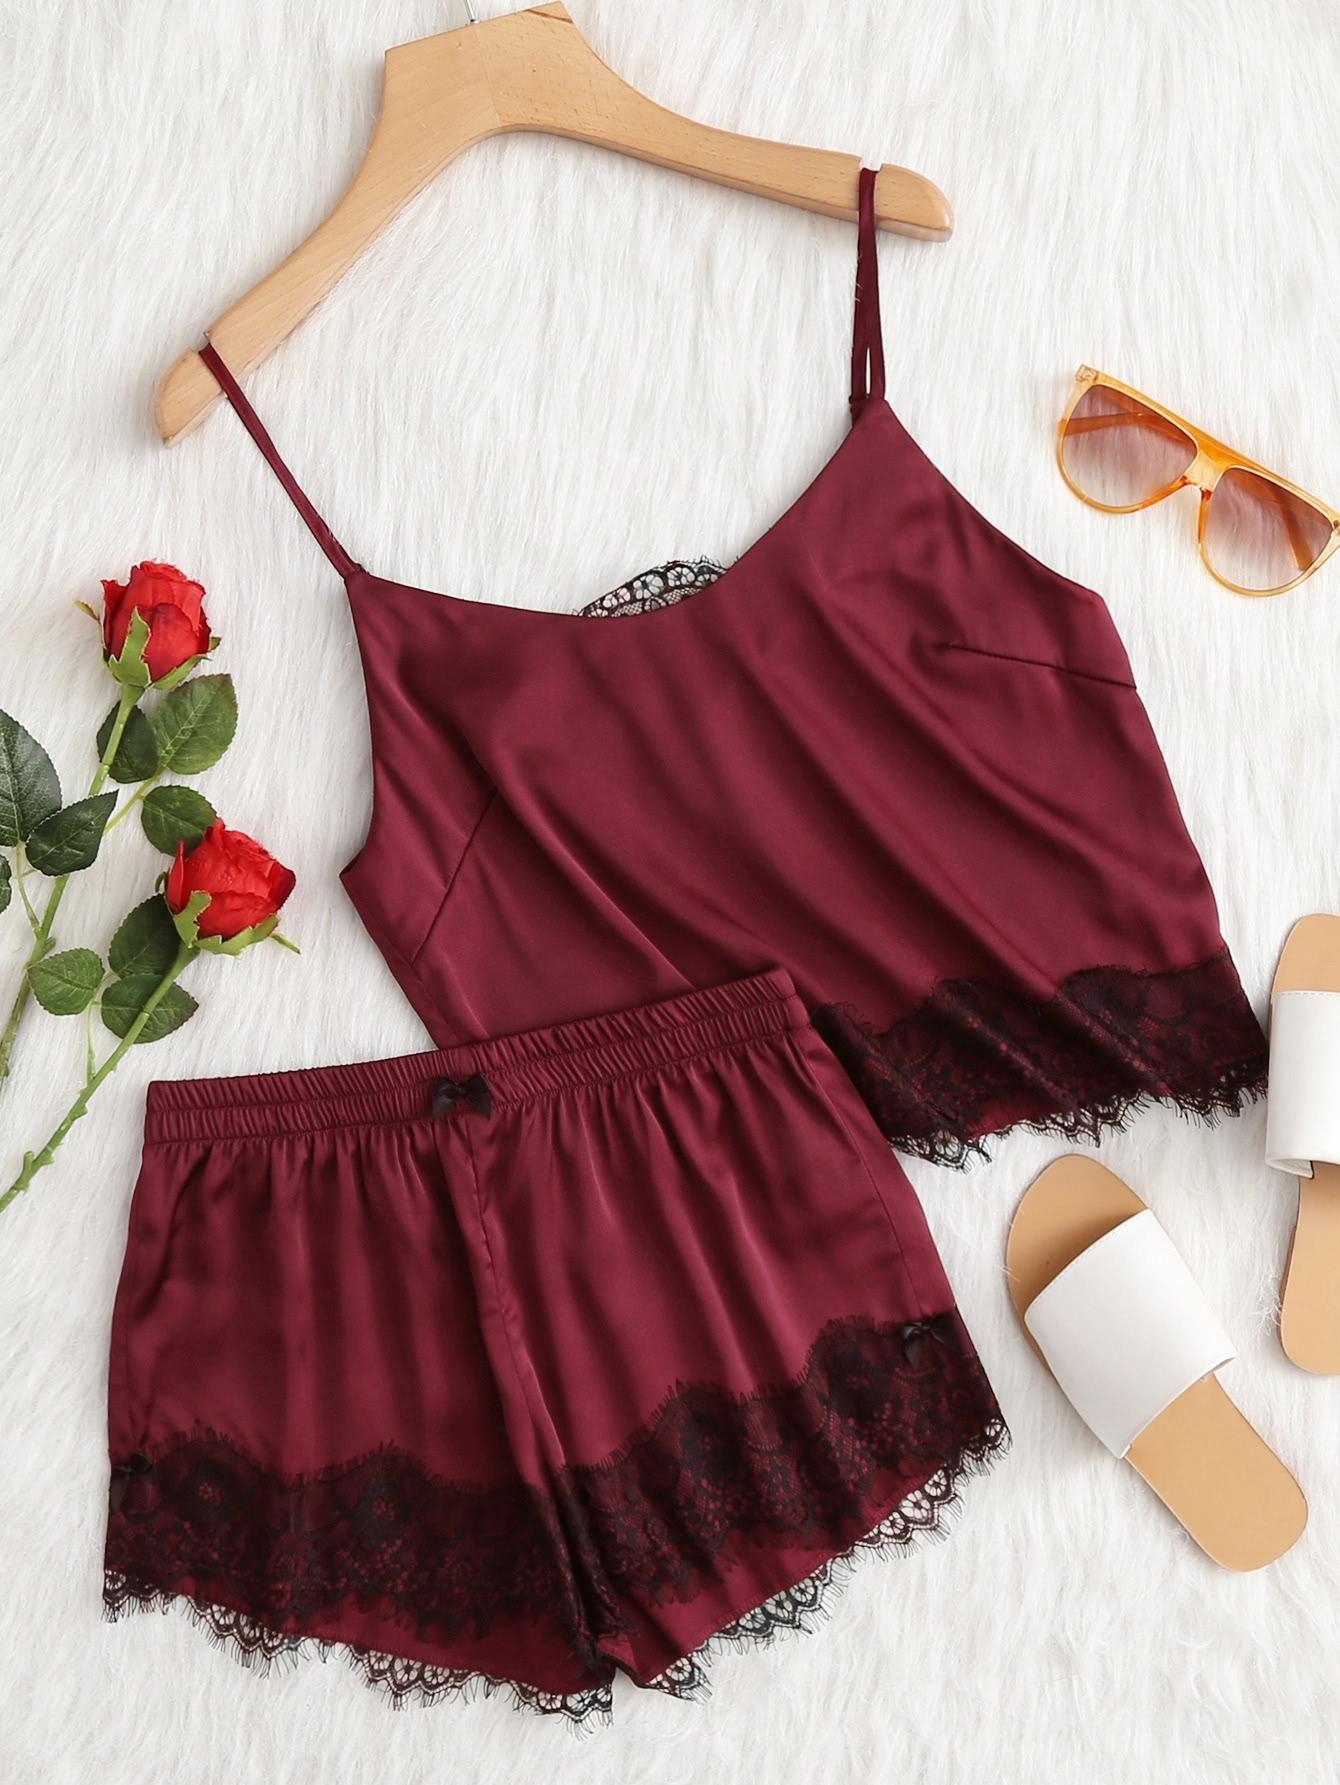 71edeb57ea #Valentines #AdoreWe #SheIn - #SheIn Lace Applique Satin Cami & Shorts PJ  Set - AdoreWe.com